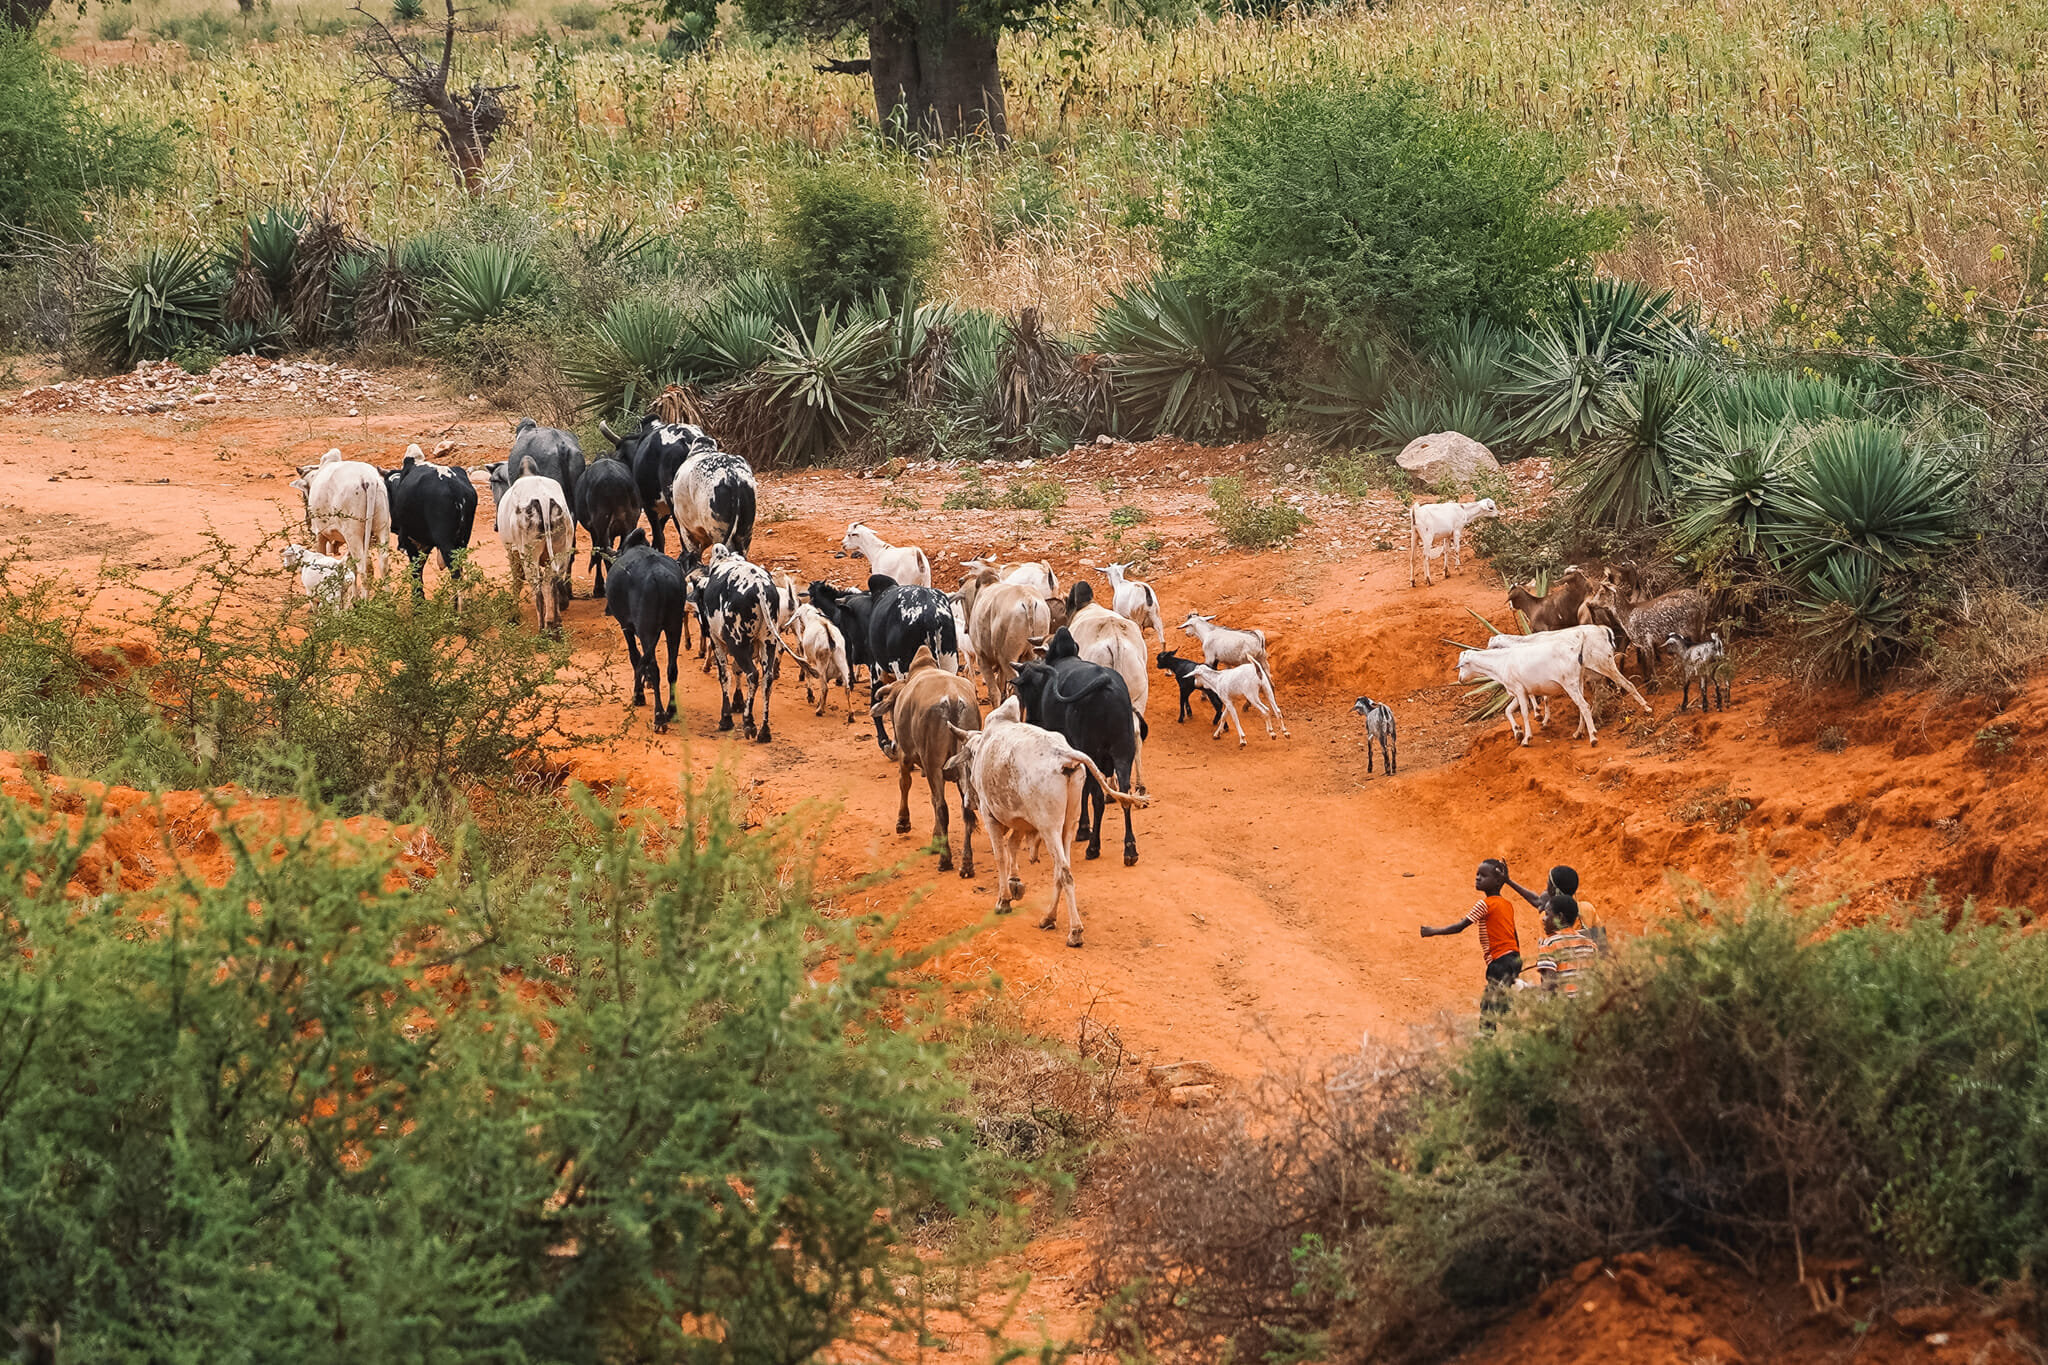 train-voyage-tanzanie-locaux-eleveurs